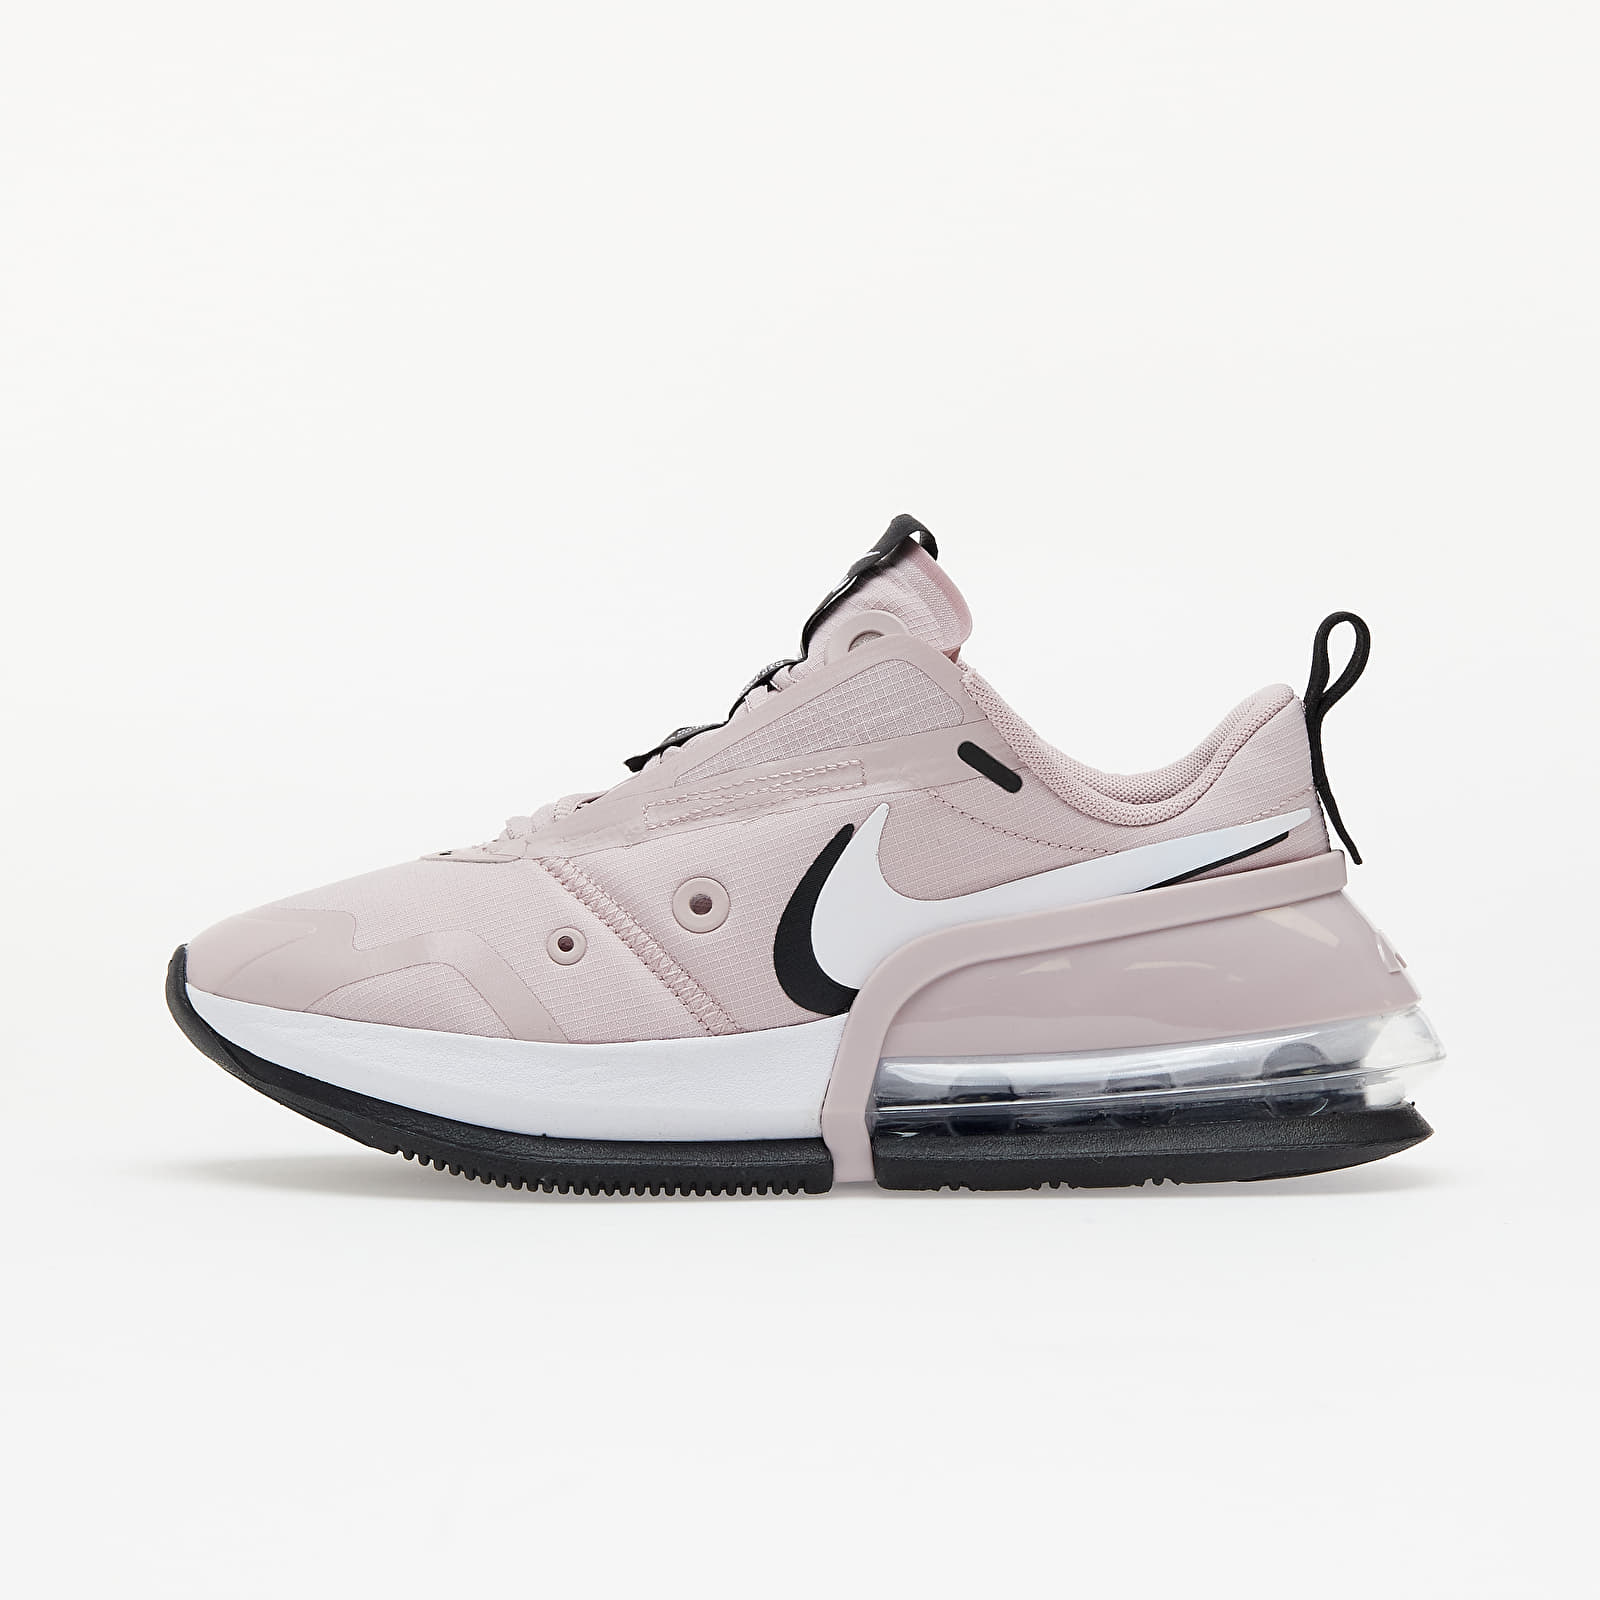 Nike W Air Max Up Champagne/ White-Black-Metallic Silver CW5346-600